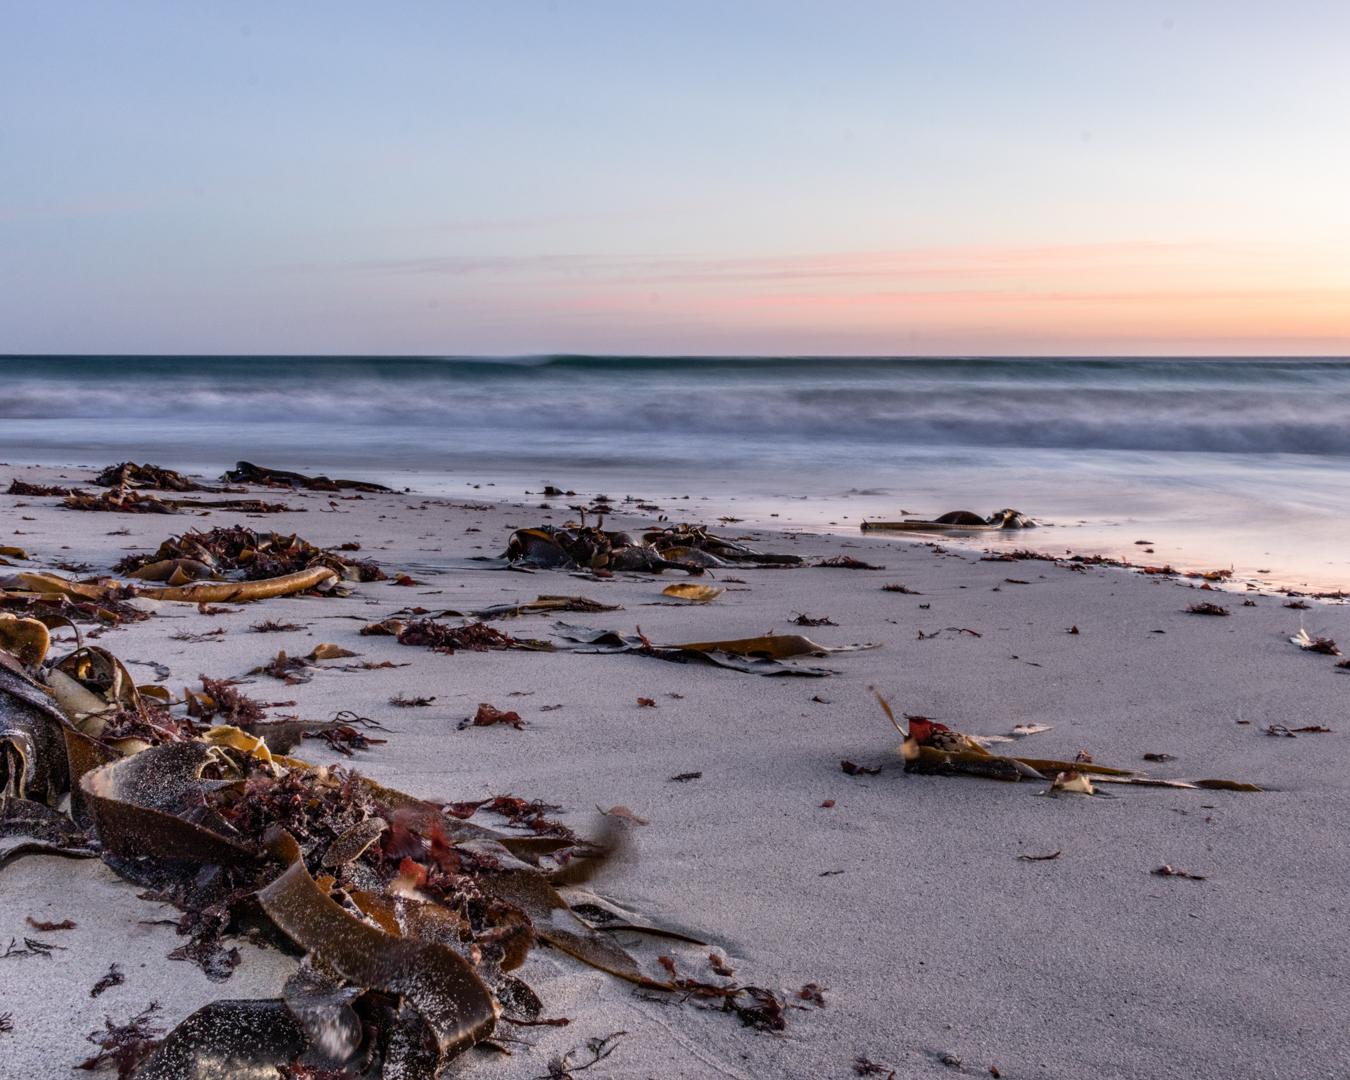 Misty Cliffs Sunset - South Africa - by Ken Treloar Photography-17.jpg